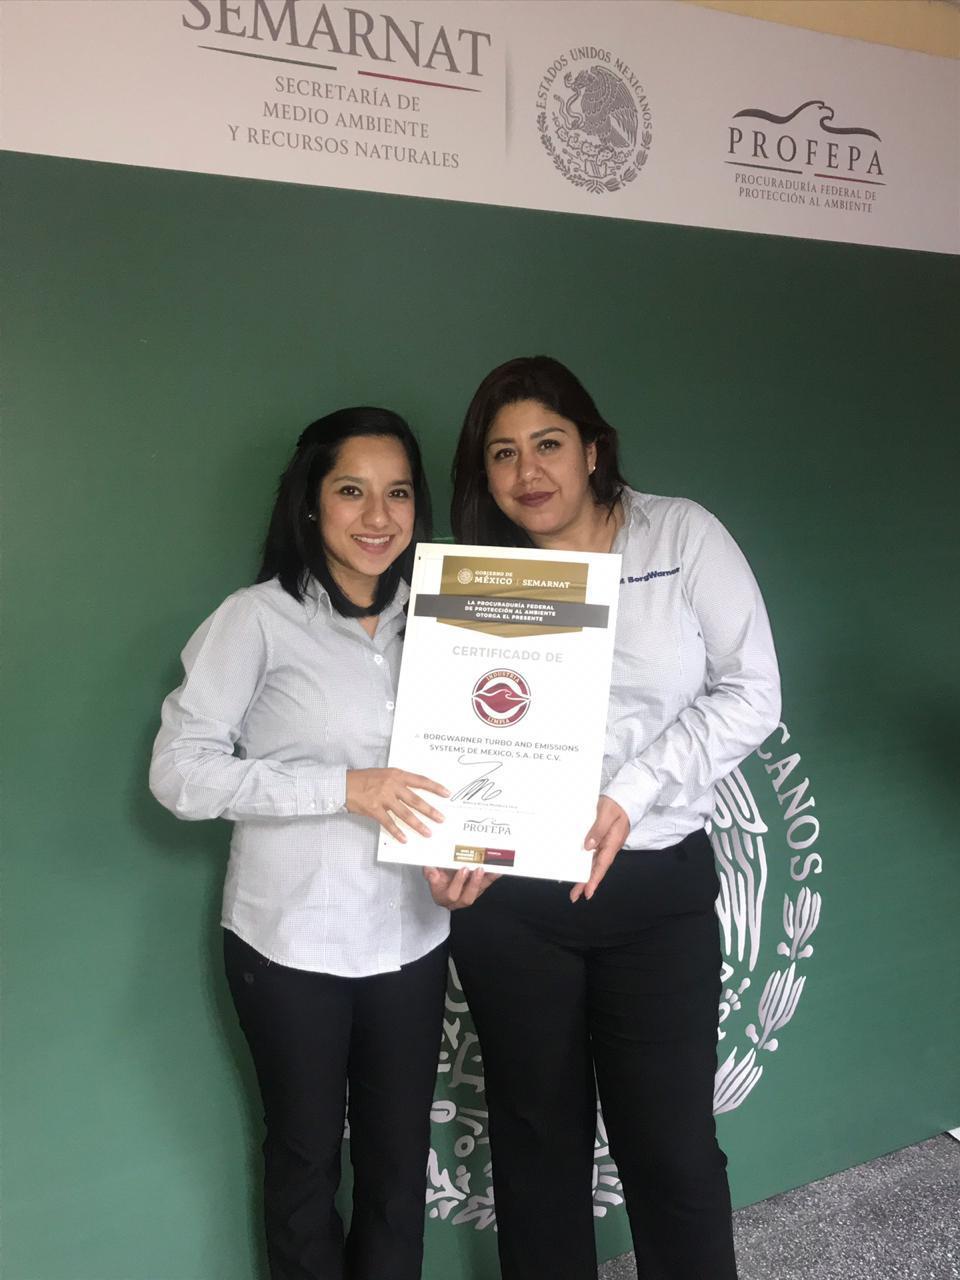 Clean Industry Certificate